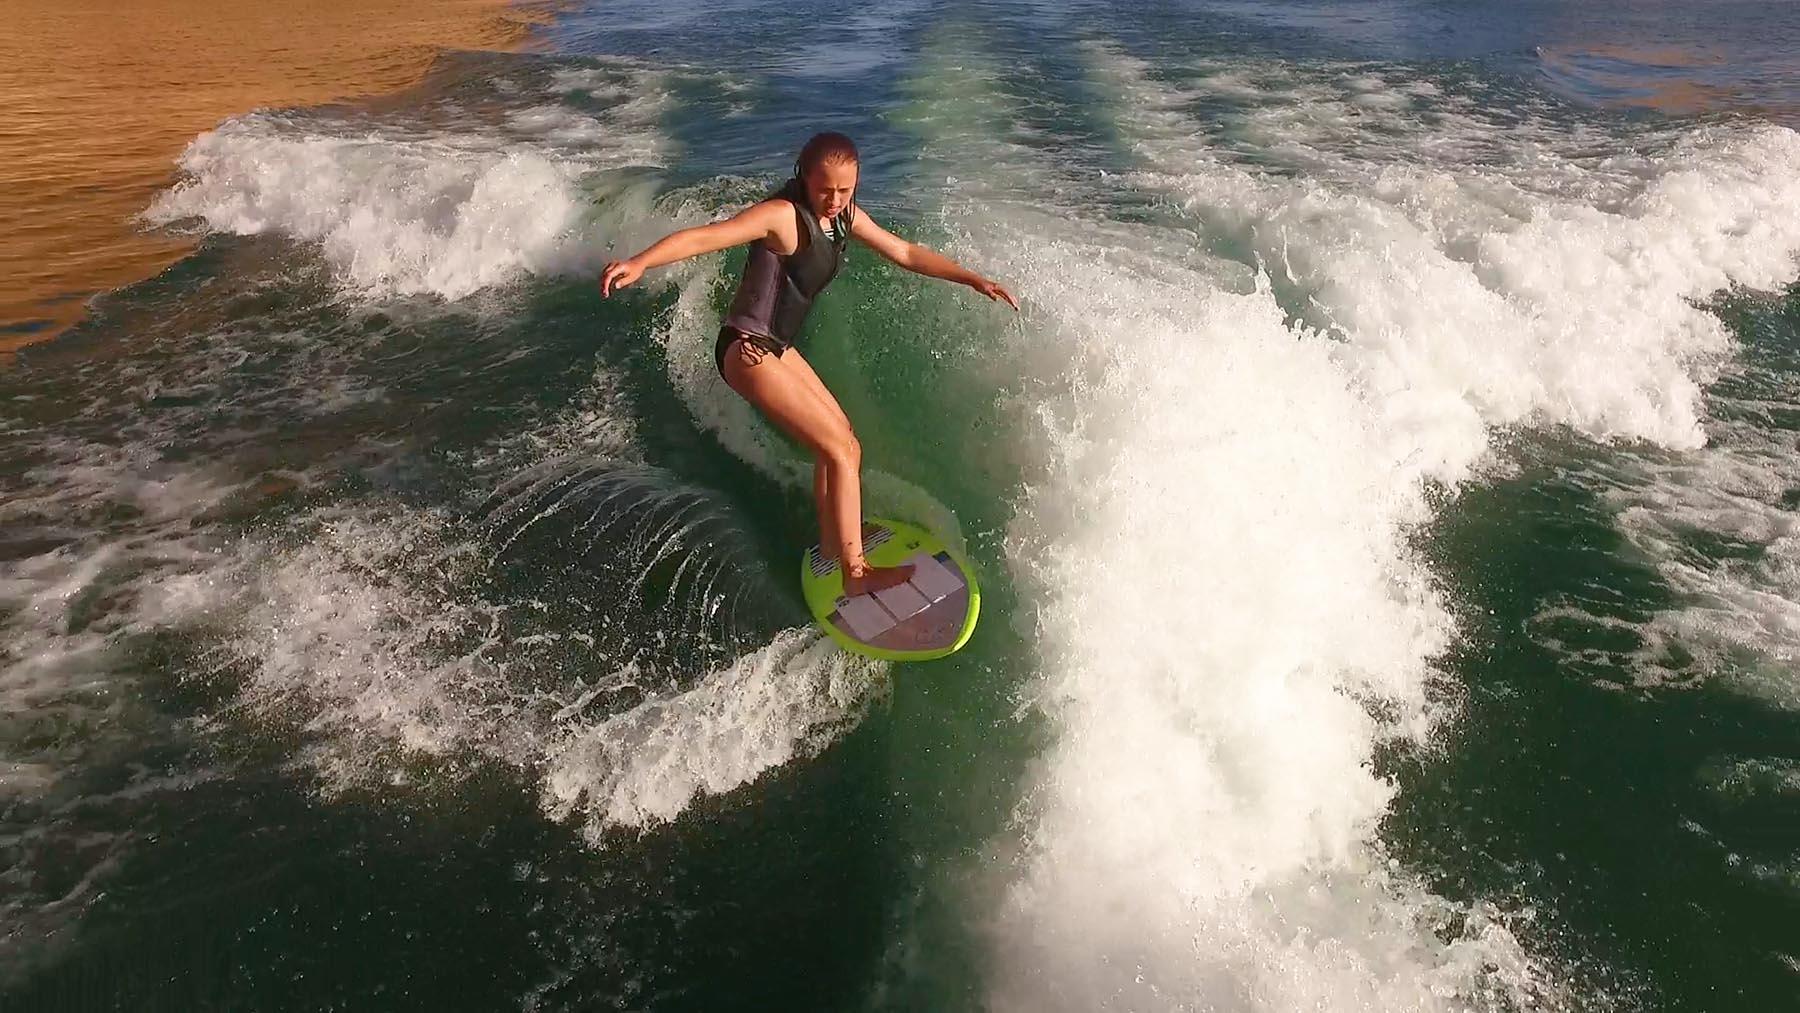 shelby_surf.jpg